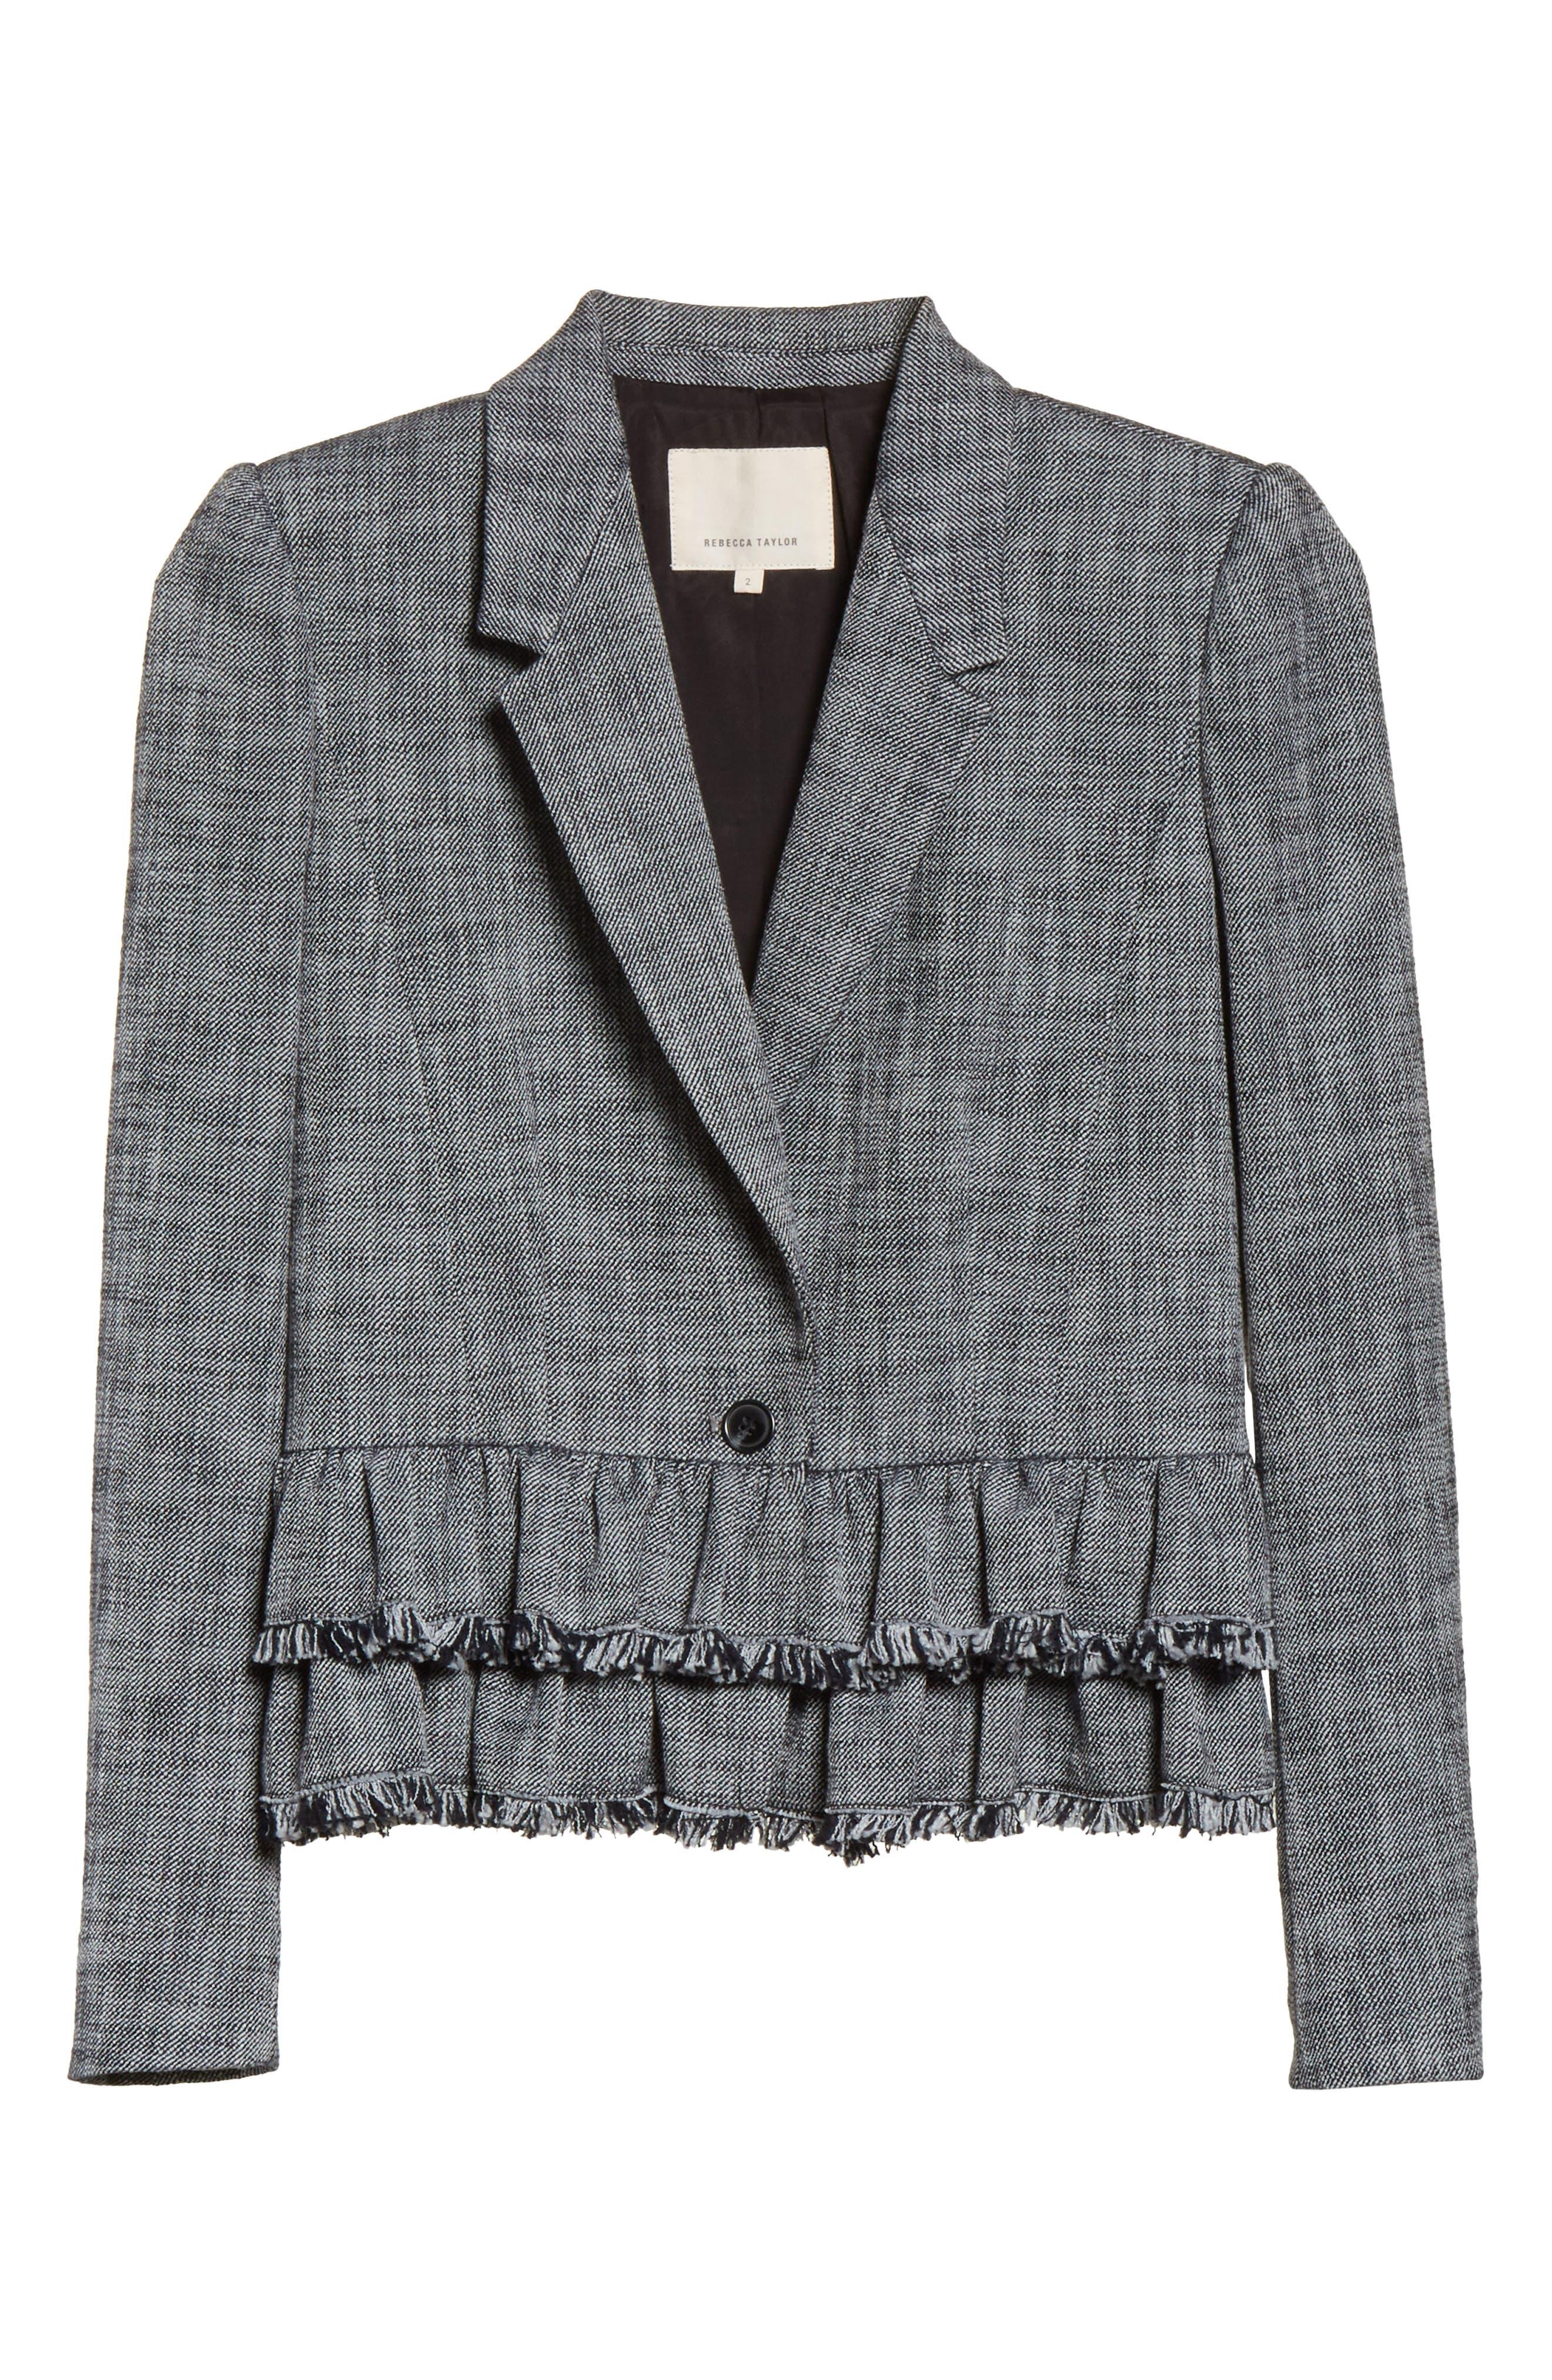 Slub Suiting Jacket,                             Alternate thumbnail 6, color,                             Grey/ Black Combo